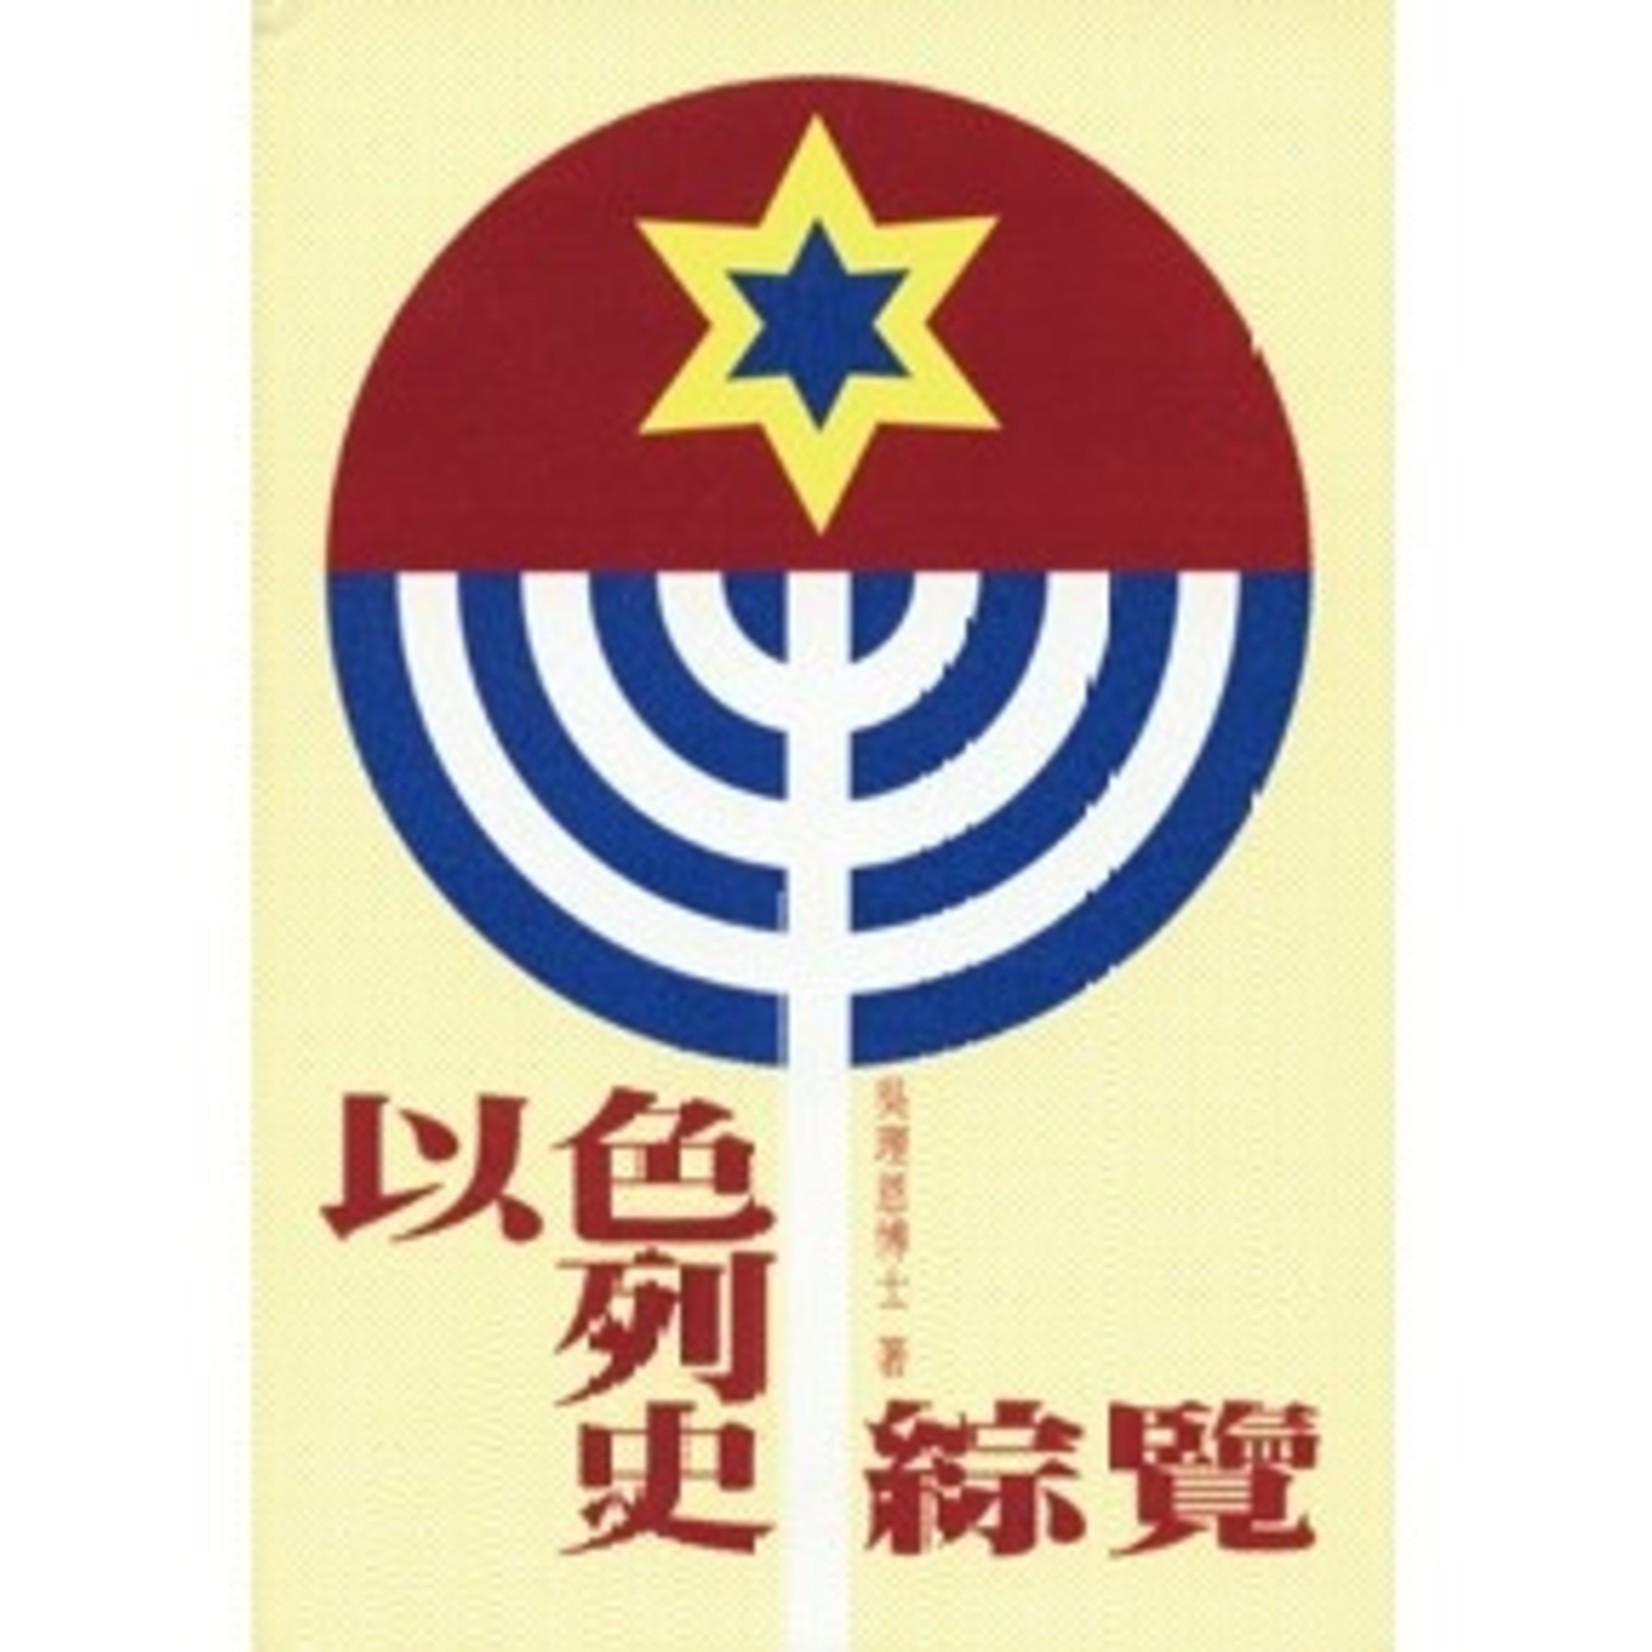 中華福音神學院 China Evangelical Seminary 以色列史綜覽 A Survey of Israels History